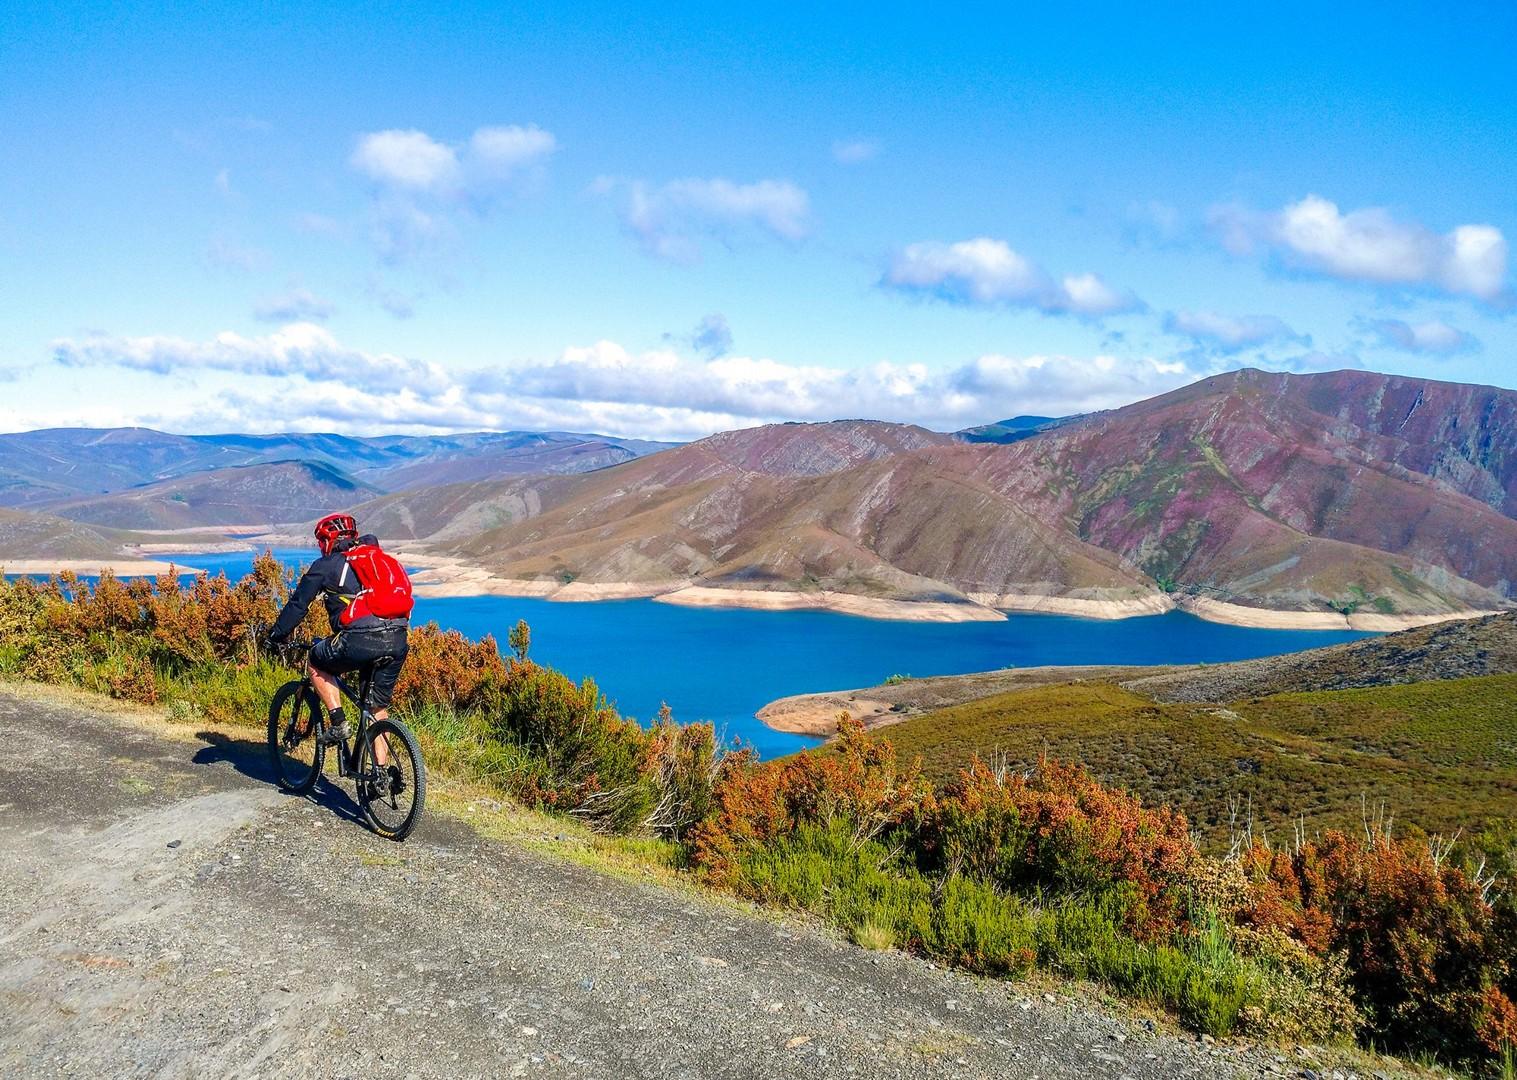 IMG_20170518_101600188.jpg - Spain - Ruta de la Plata - Guided Mountain Bike Holiday - Mountain Biking